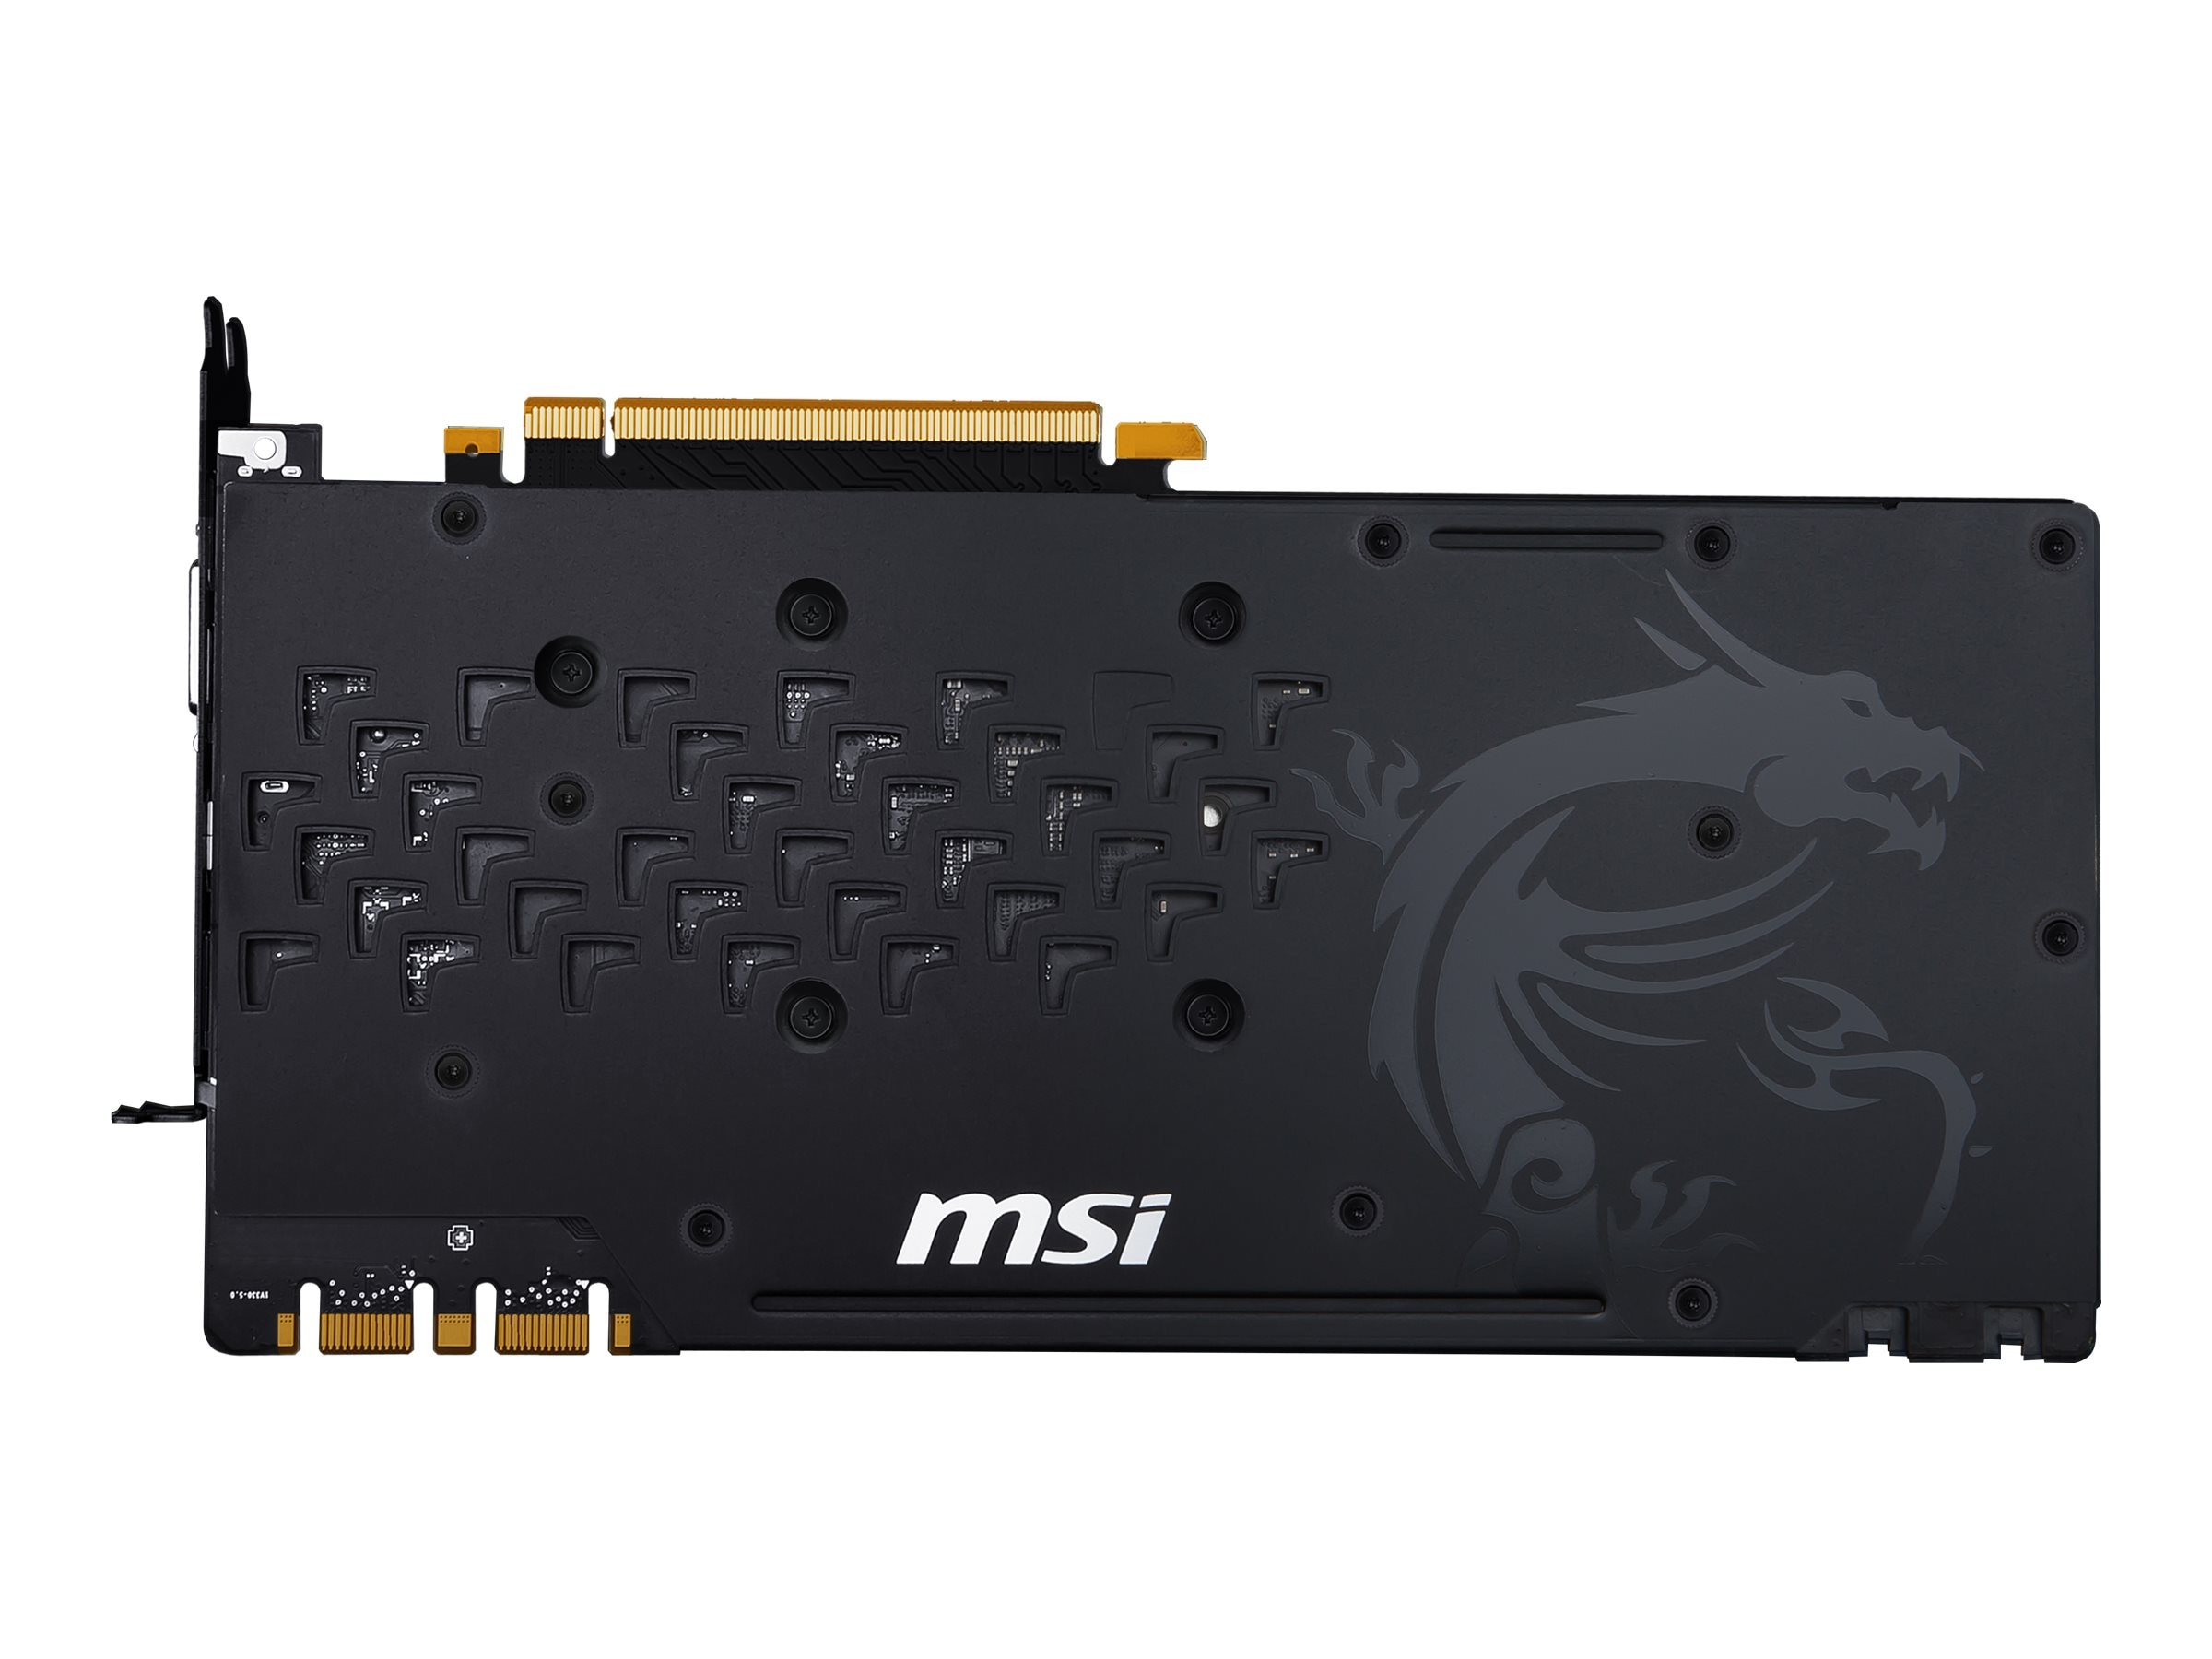 Microstar GTX 1080 GAMING X 8G Image 8